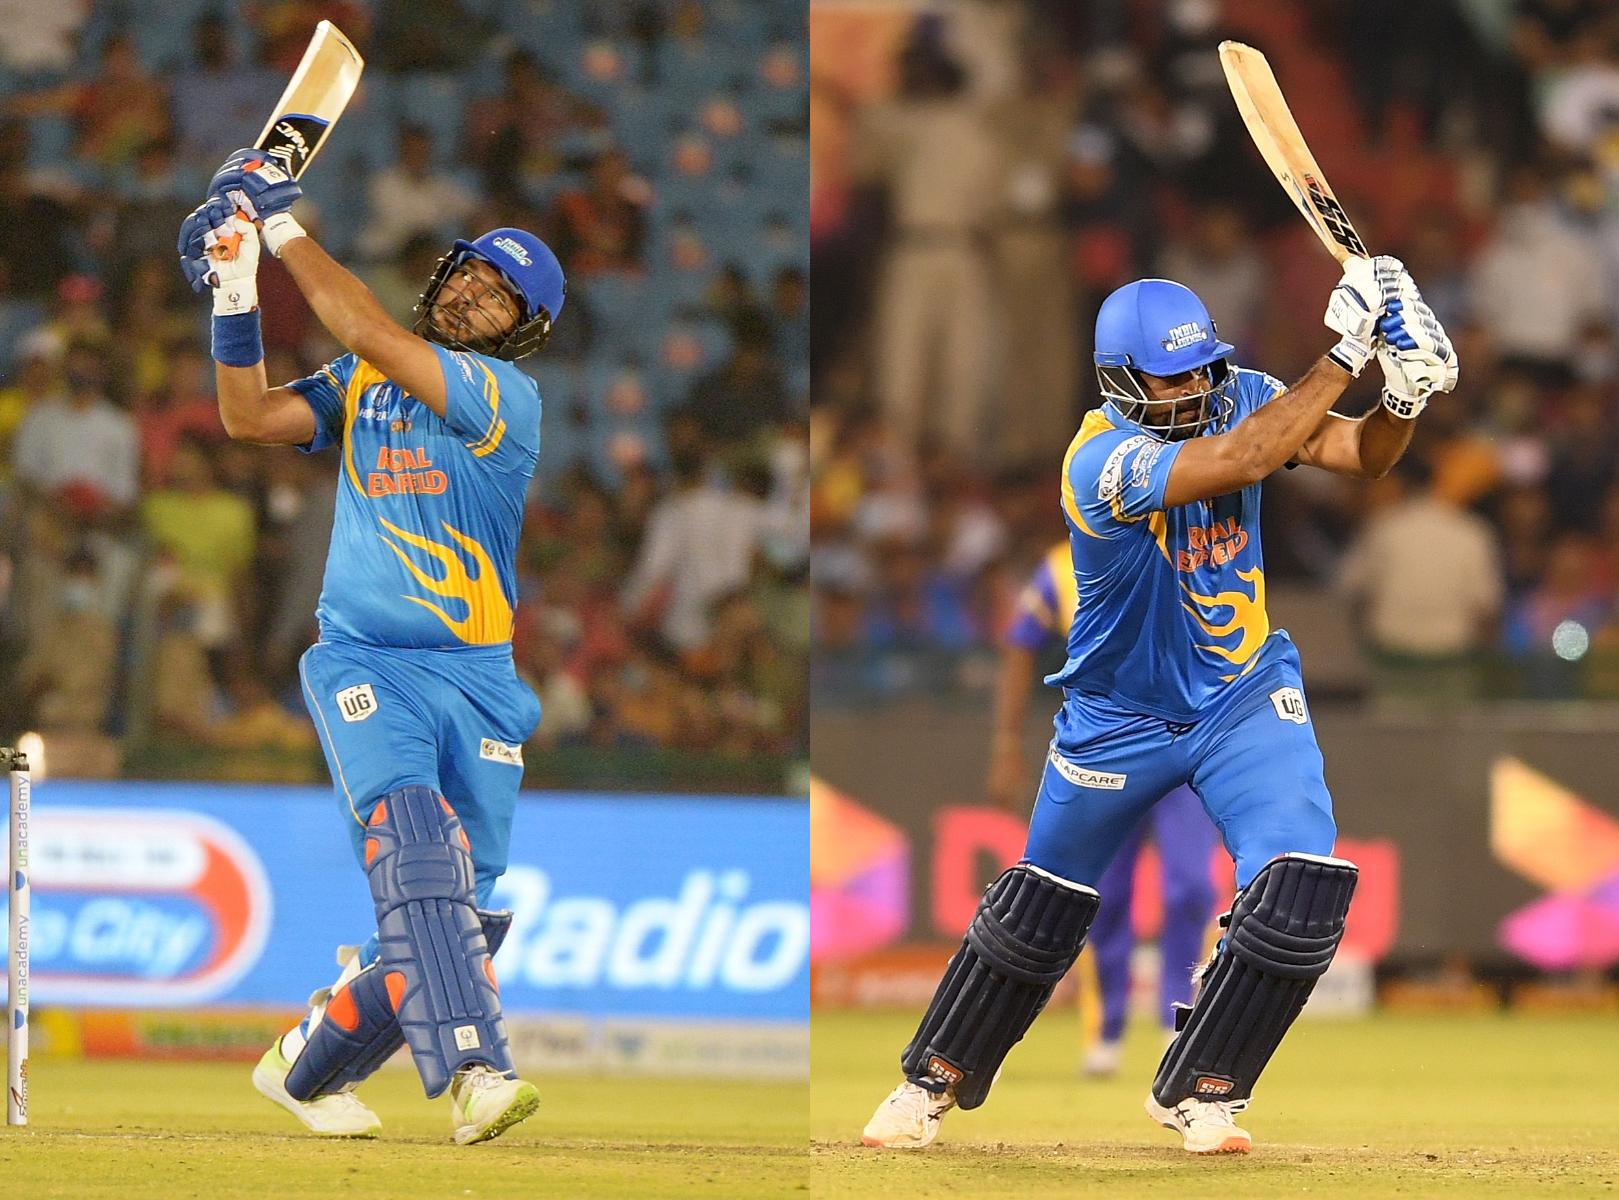 Yuvraj Singh and Yusuf Pathan hammered Sri Lanka Legends bowling   RSWS